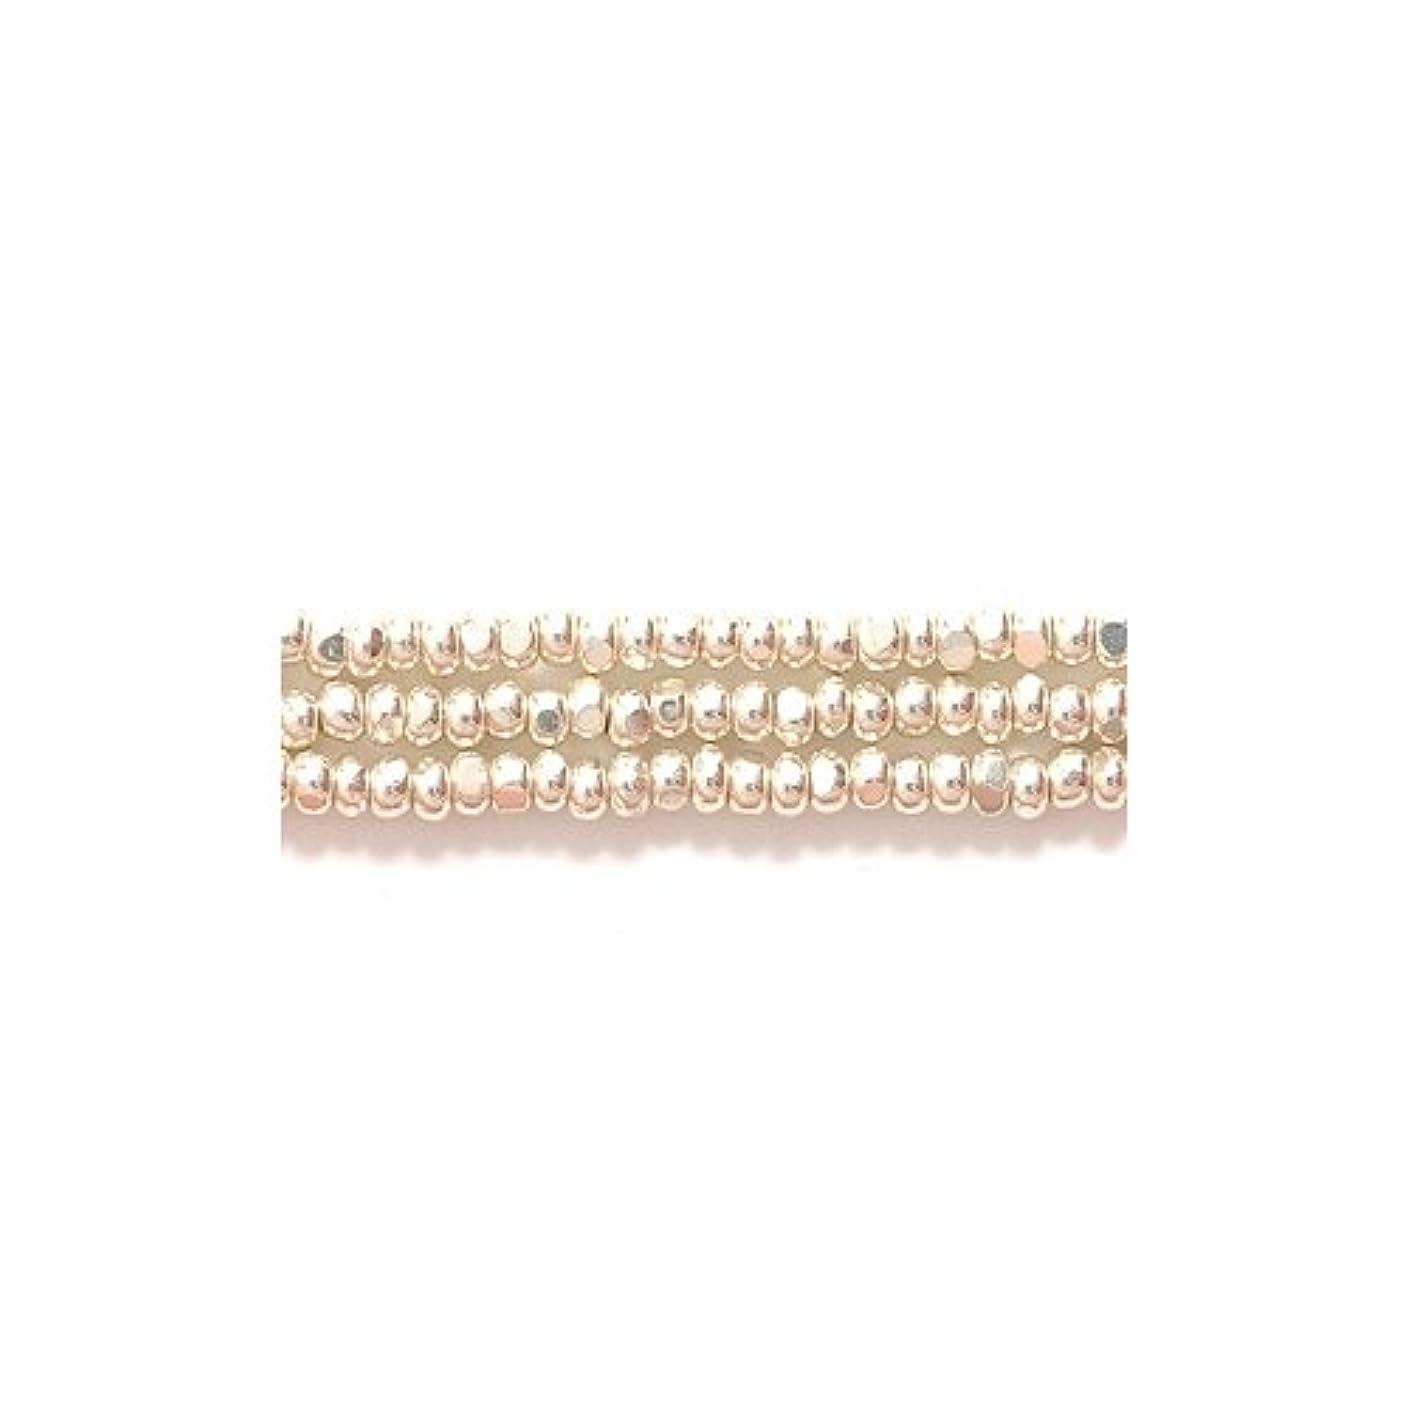 Preciosa Ornela Czech Seed Bead, True Cut Metallic Silver, Size 11/0